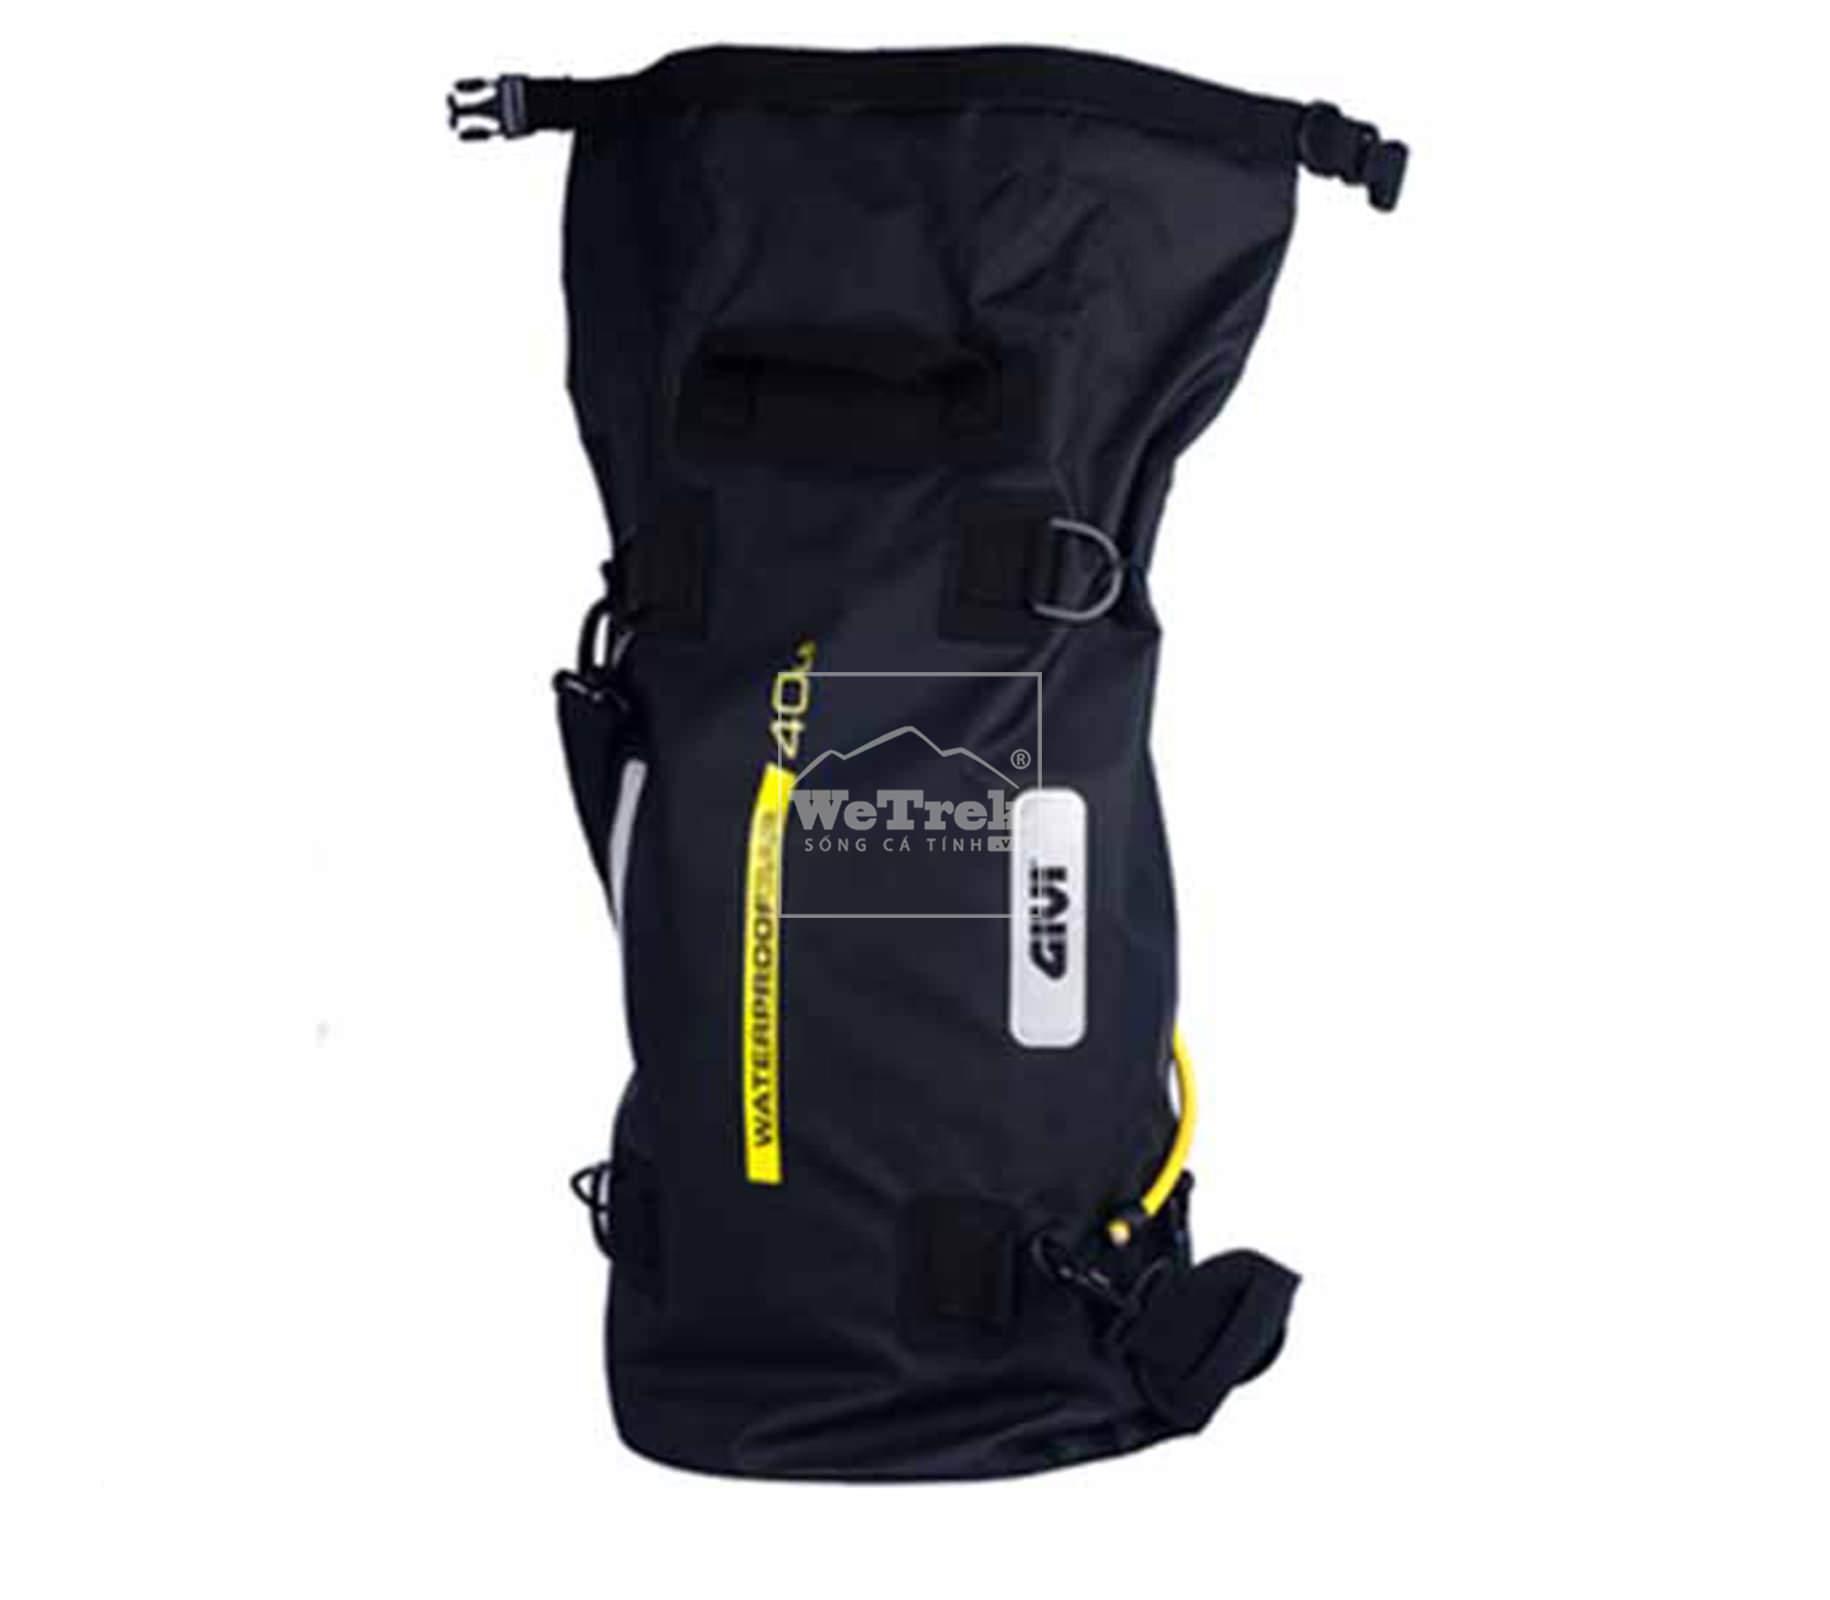 tui-chong-nuoc-40L-givi-prime-cargo-bag-pcb01-wetrek.vn-3